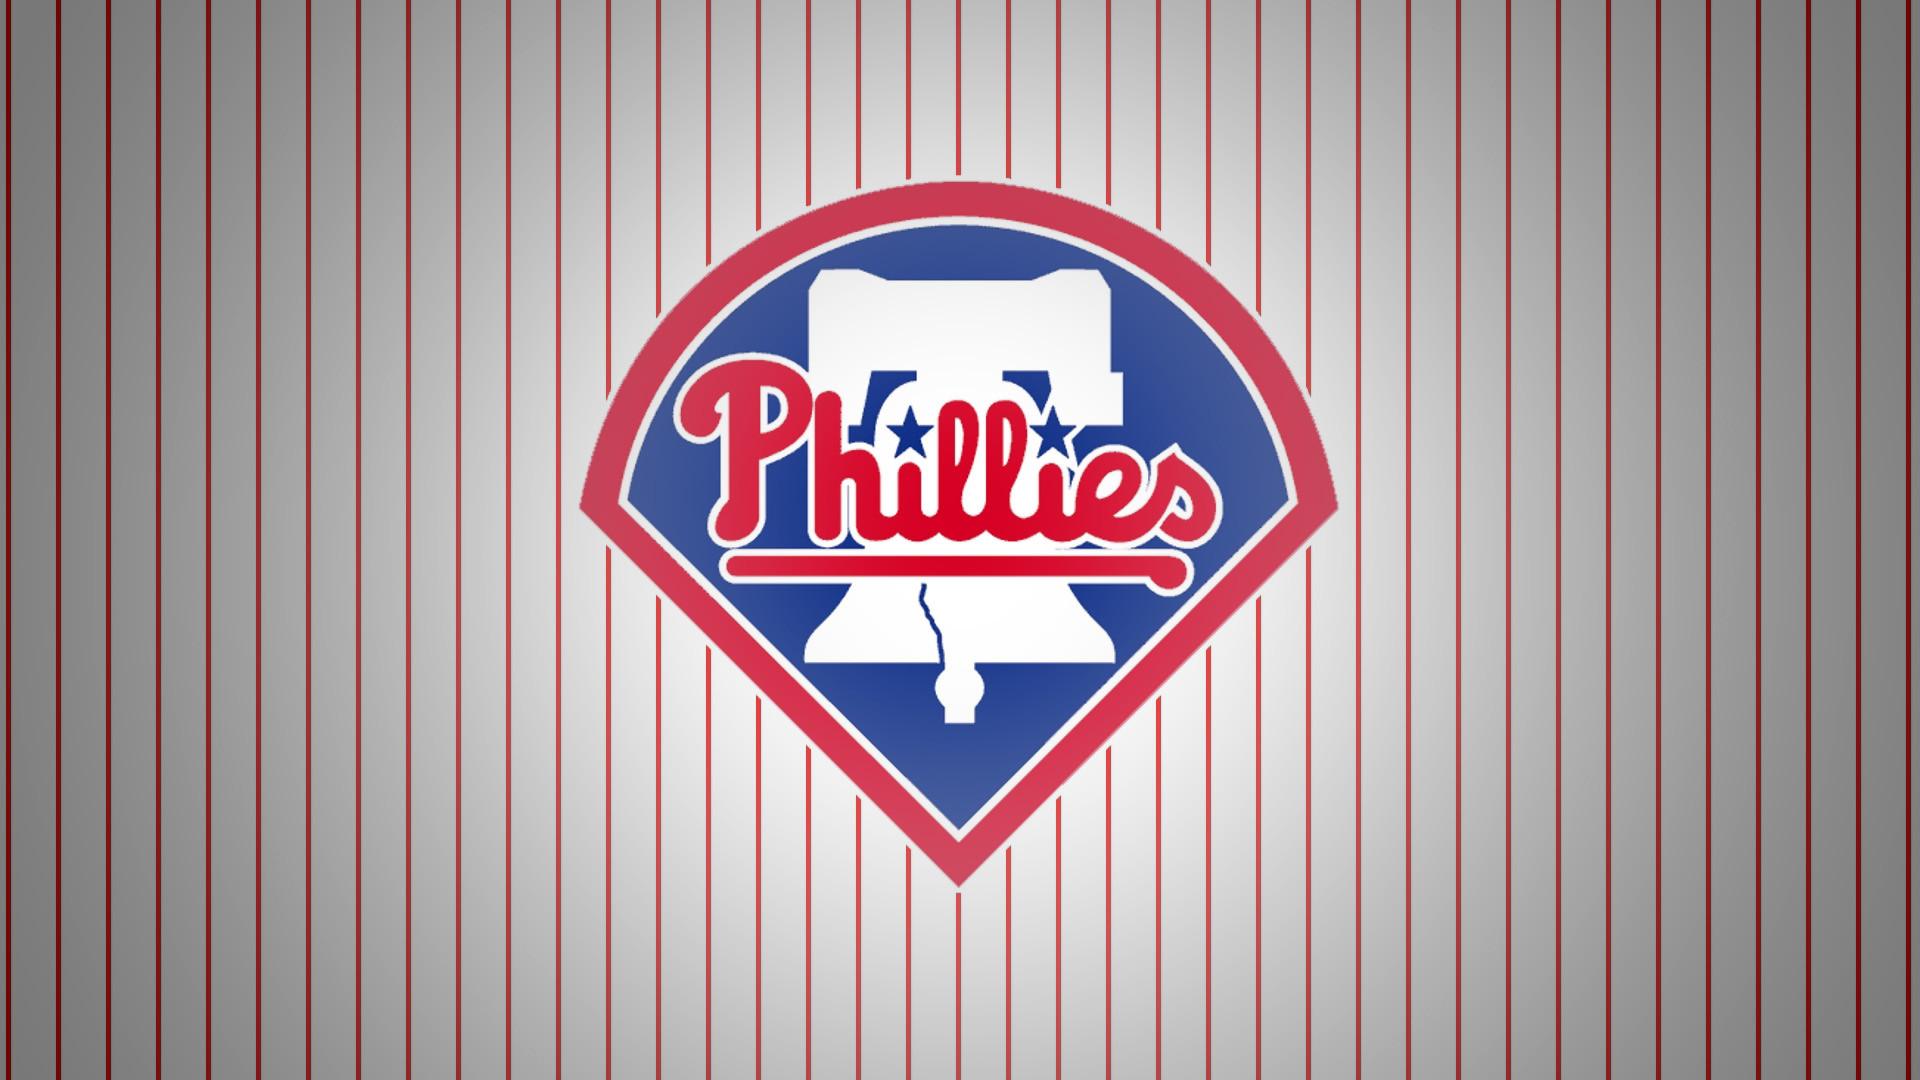 Philadelphia Phillies Wallpaper Hd Cool 7 HD Wallpapers